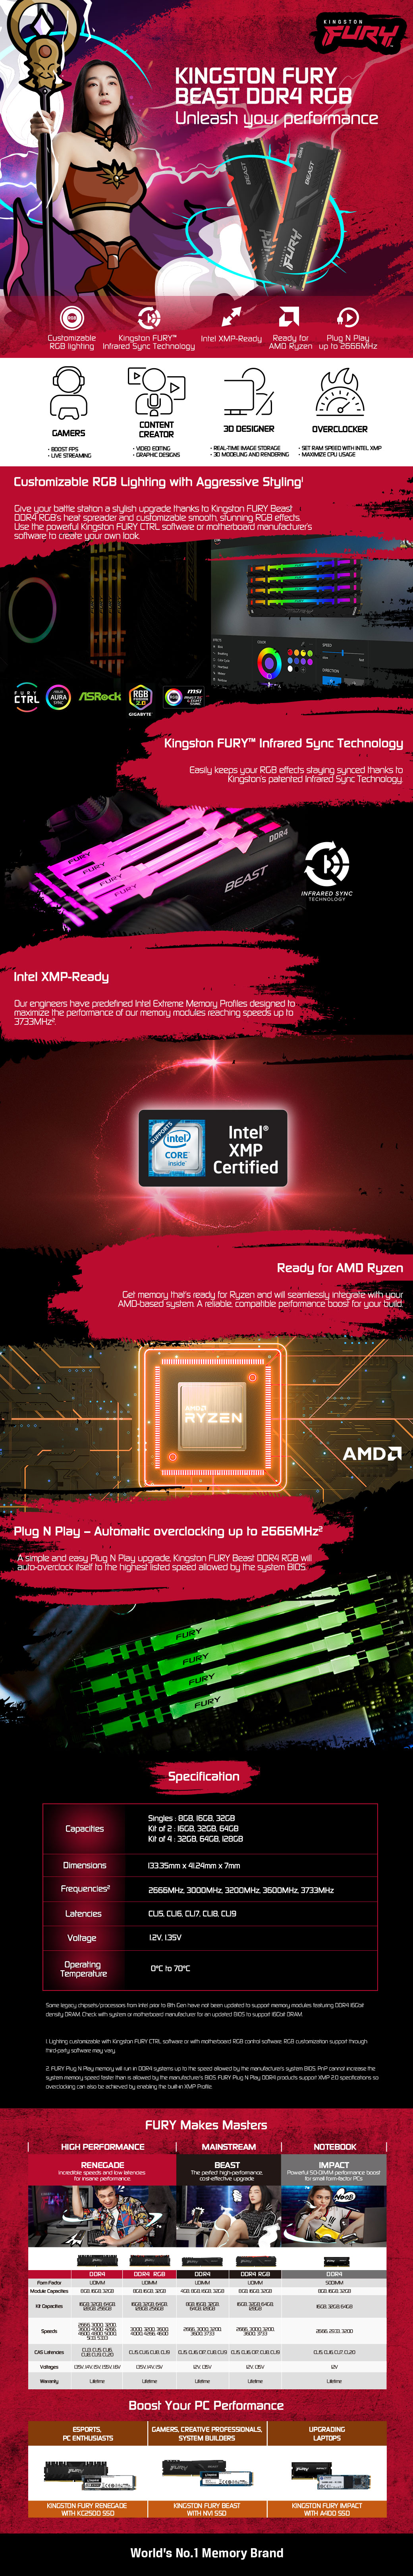 Kingston FURY Beast DDR4 RGB_Etail banner_EN.jpg